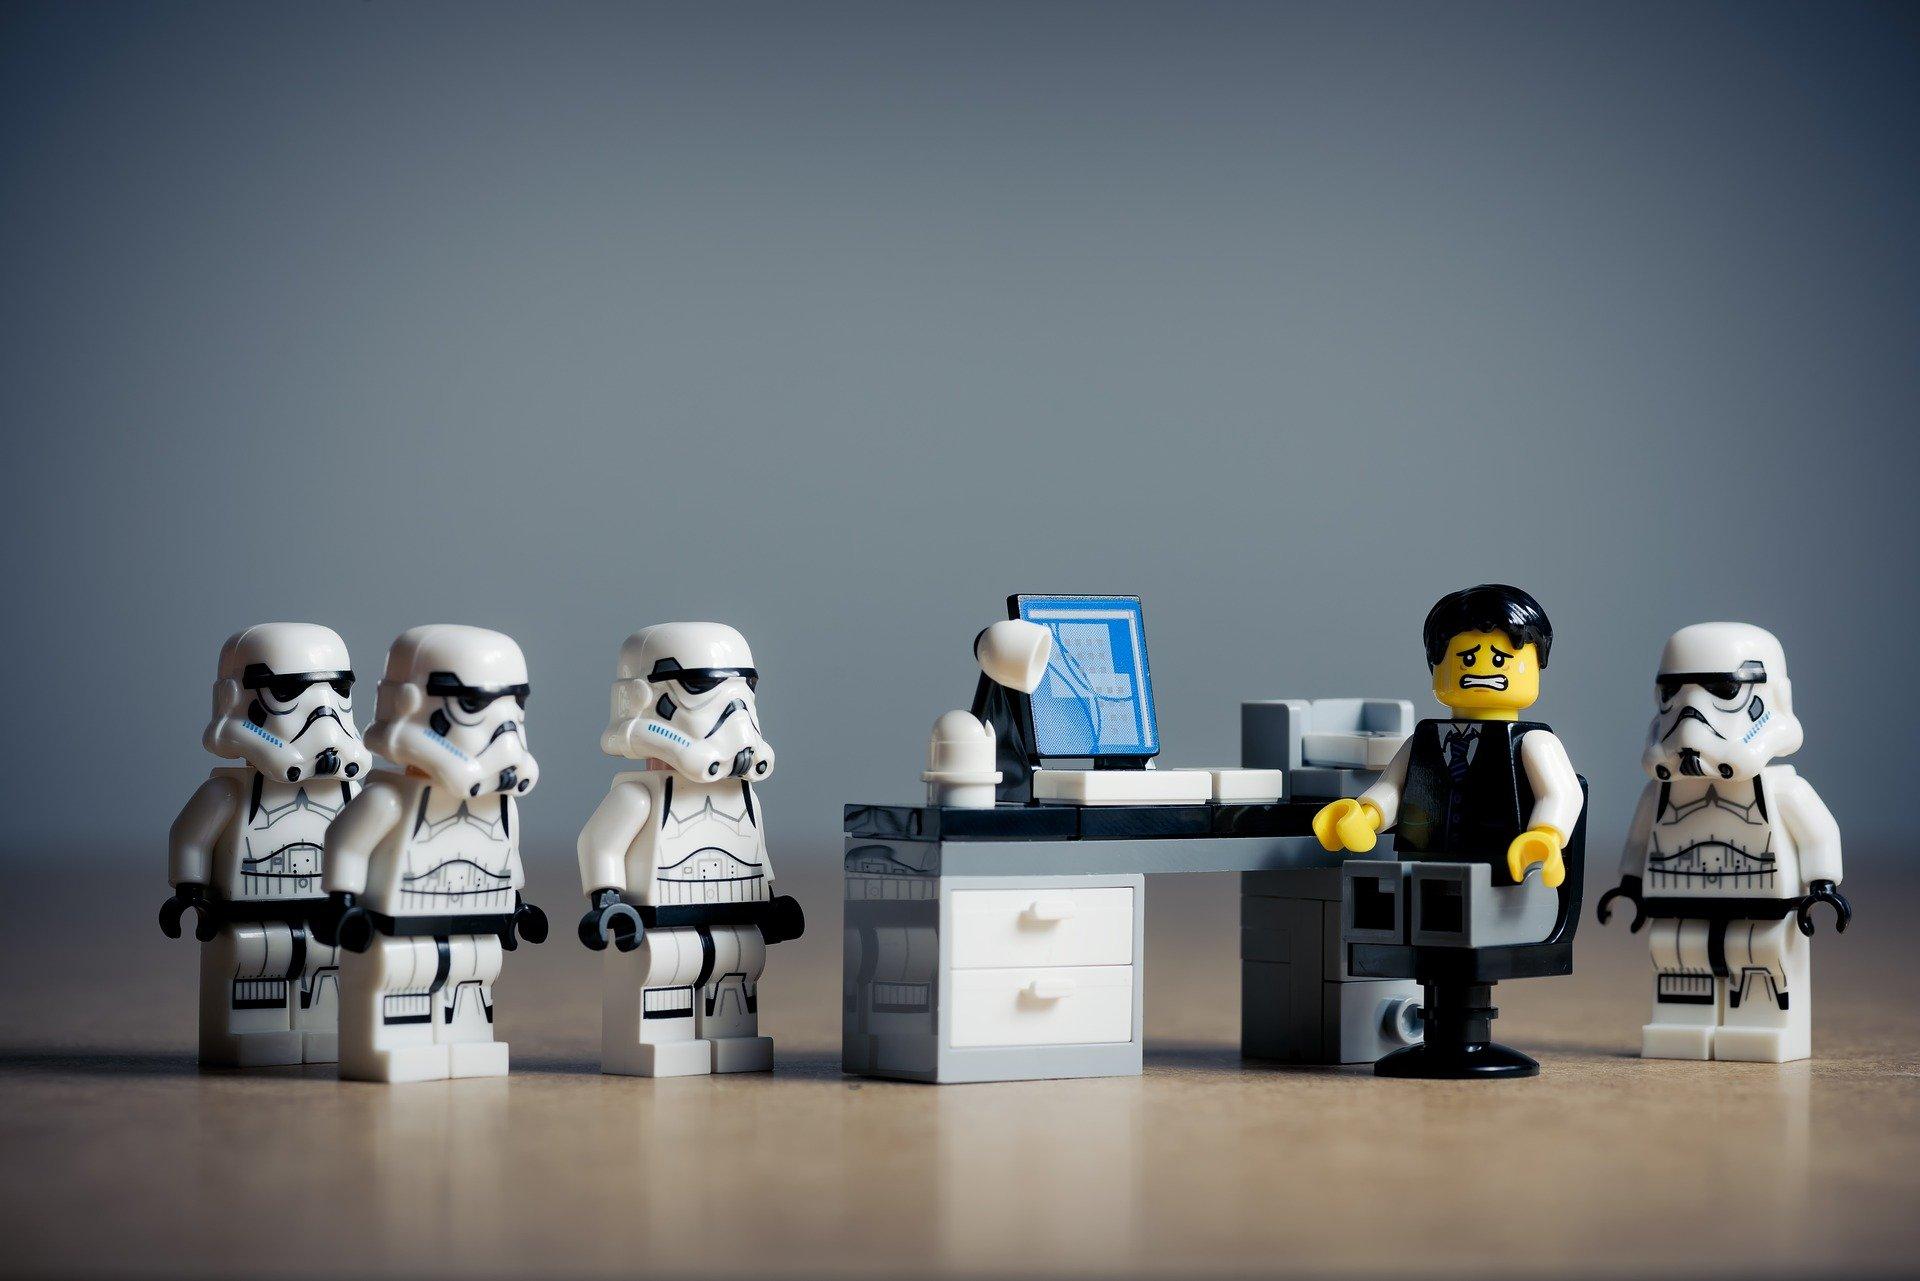 lego-insight-marketing-business-insights